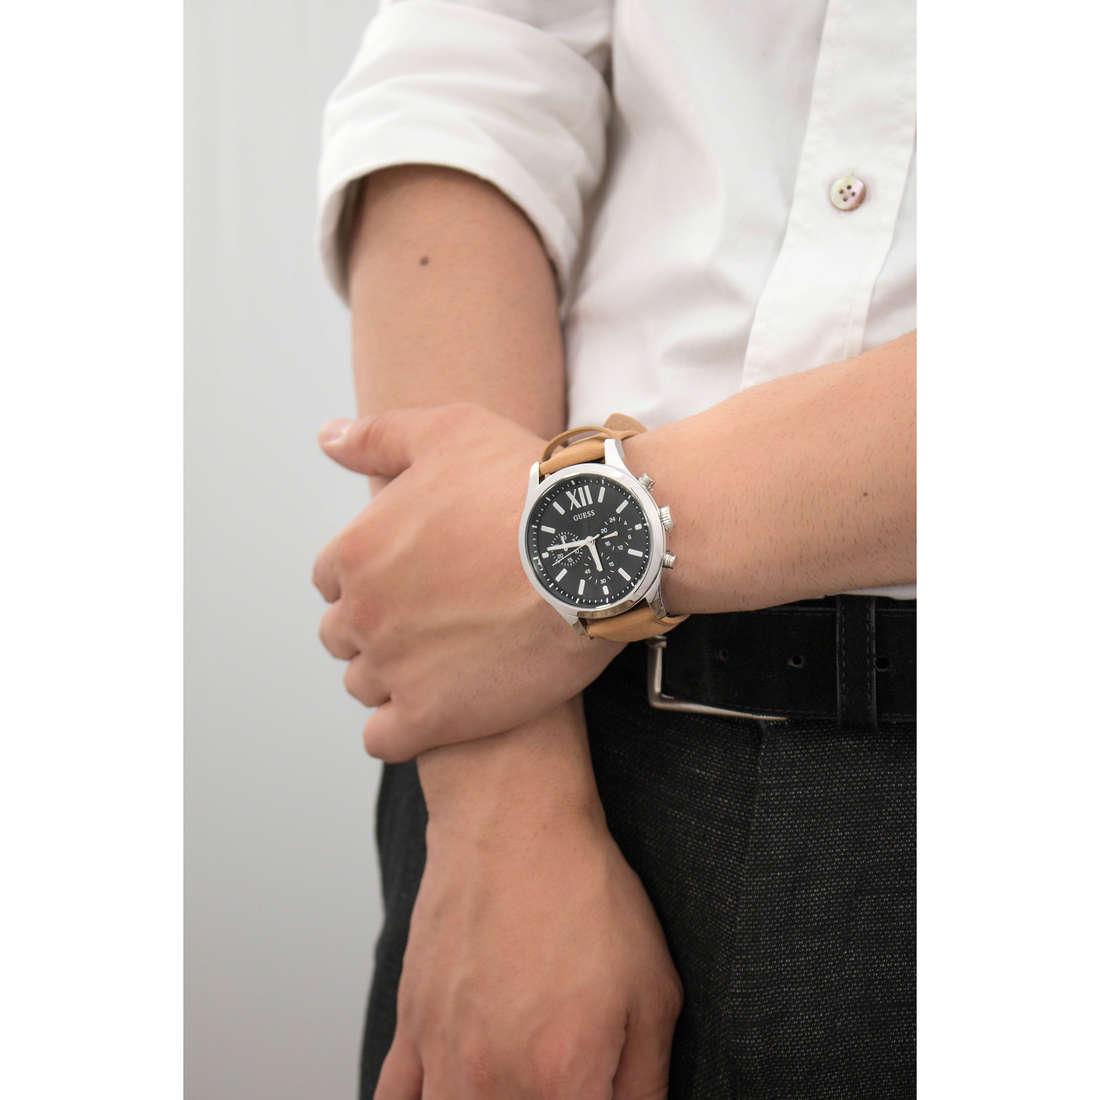 Guess cronografi uomo W0789G1 indosso